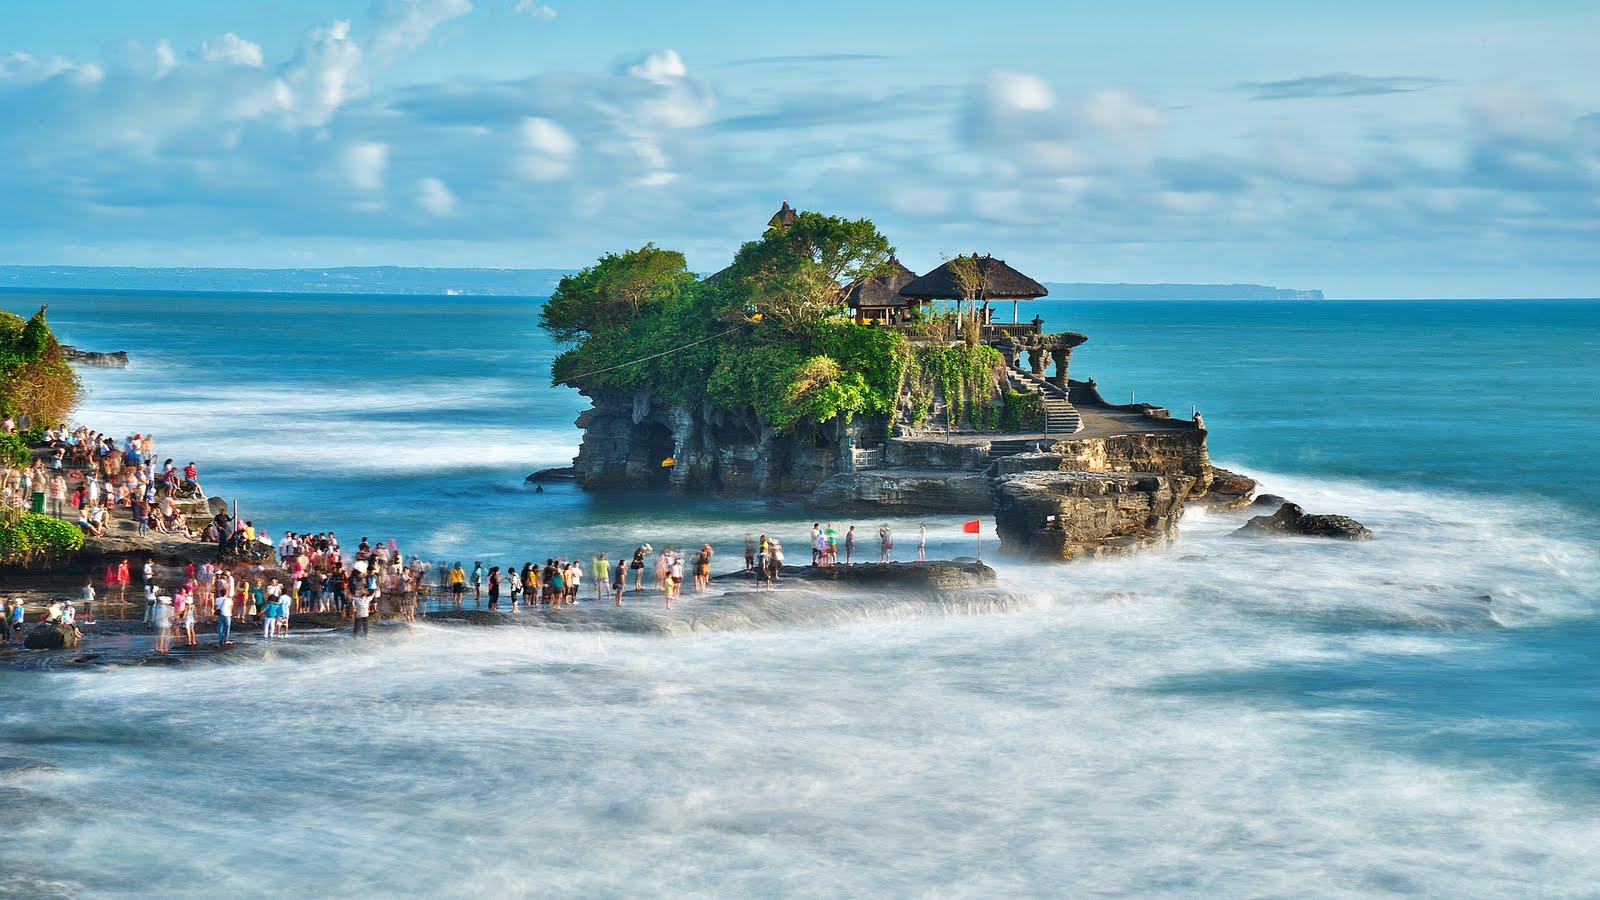 http://1.bp.blogspot.com/-uAKogM5m2FU/UOWSSlRVE9I/AAAAAAAAATE/45ZTx2g2wb0/s1600/Bali+Island+HD+Wallpaper_1.jpg